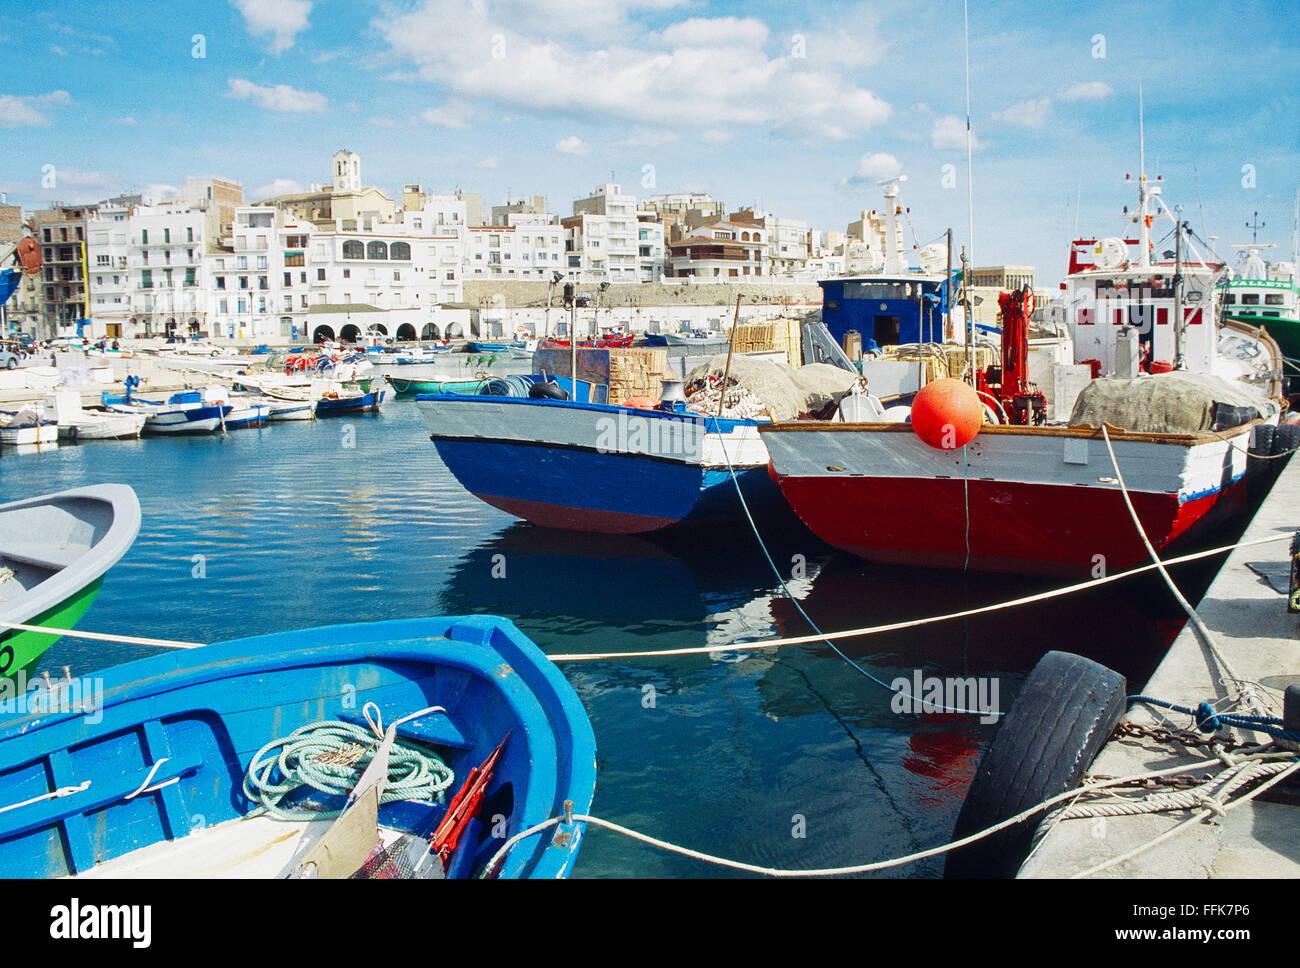 Harbour. L'Ametlla de Mar, Tarragona province, Catalonia, Spain. - Stock Image